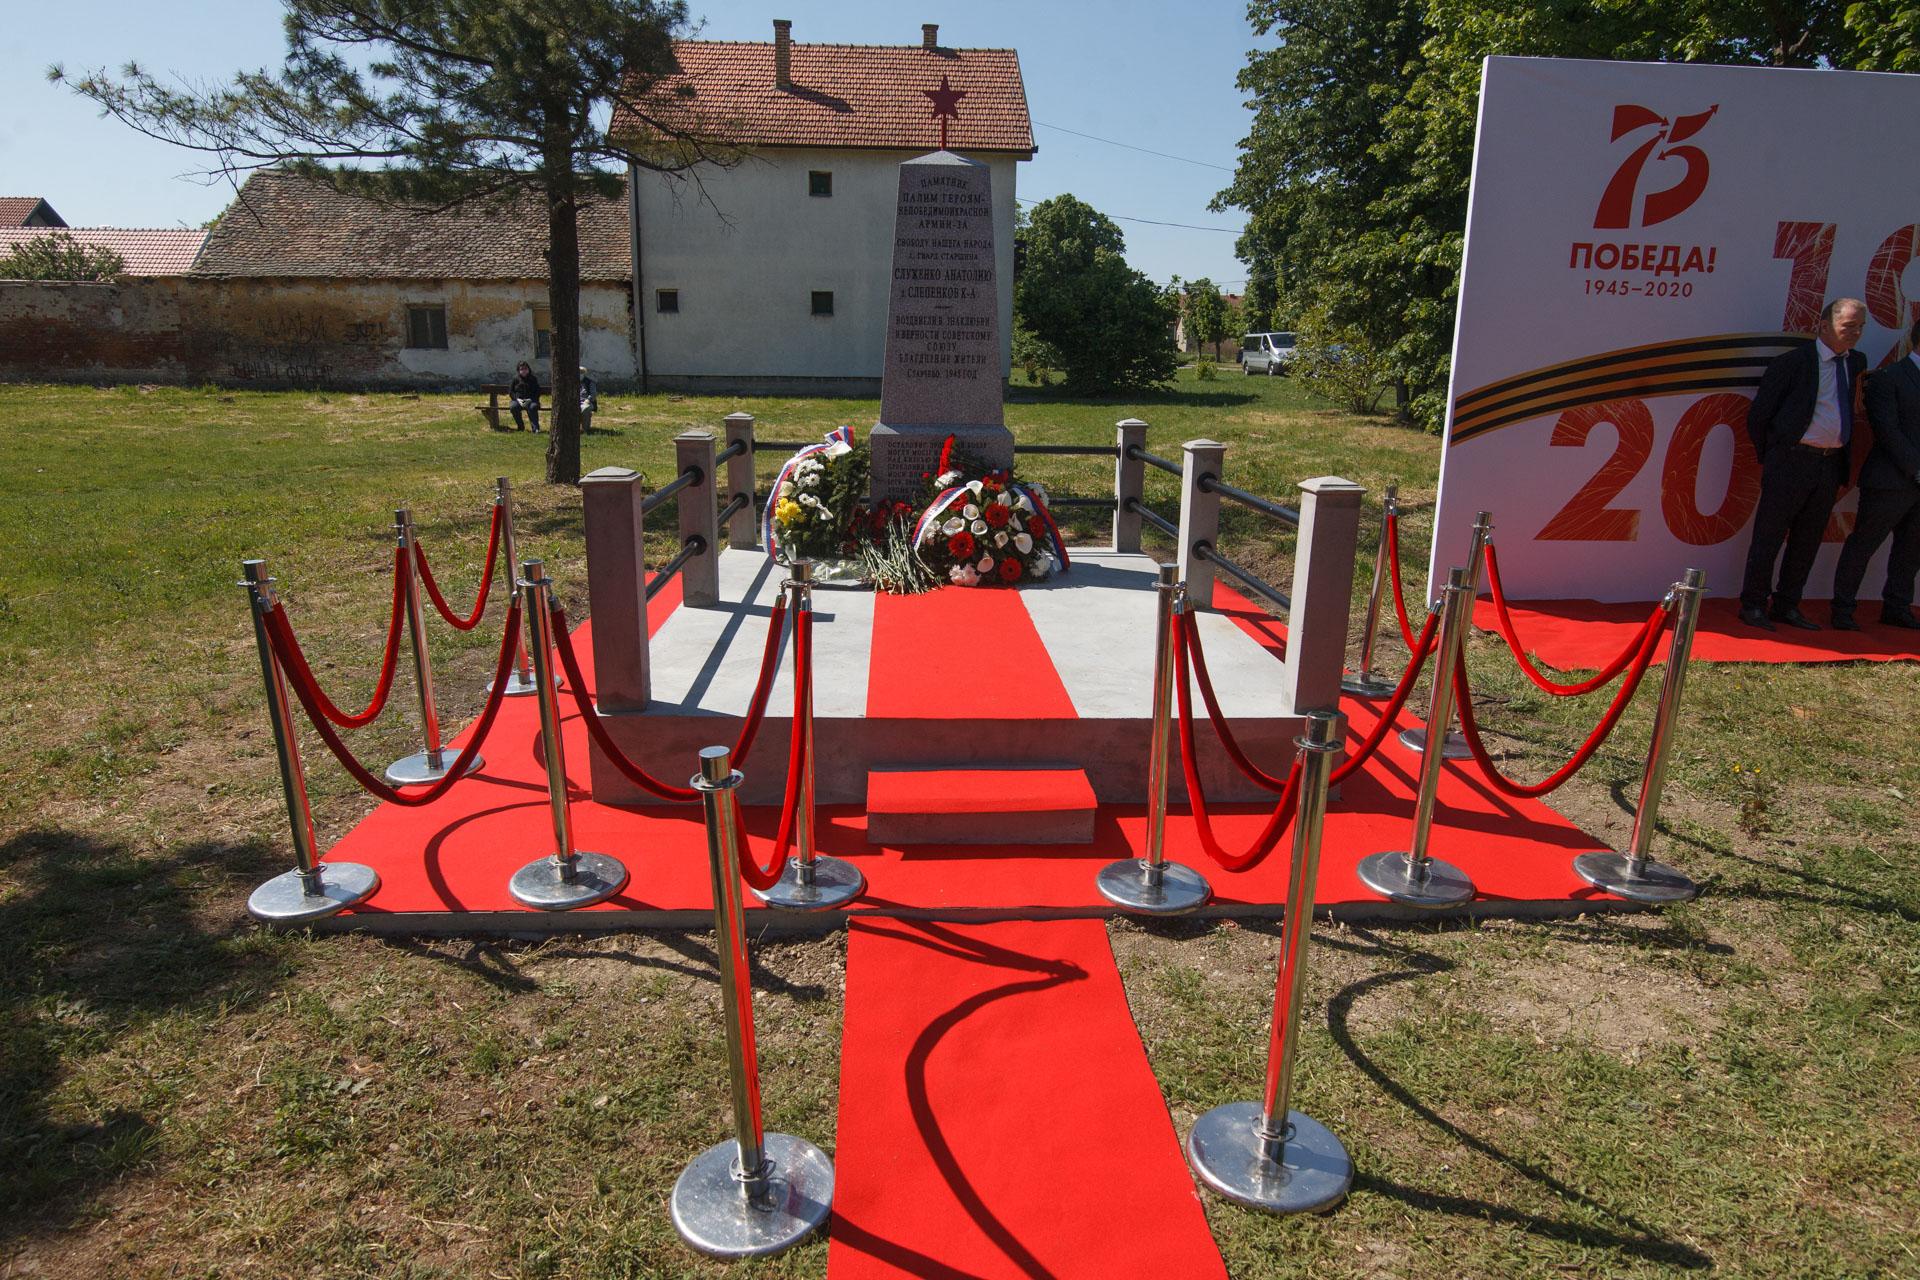 Obnovljen spomenik crvenoarmejcima u Starčevu